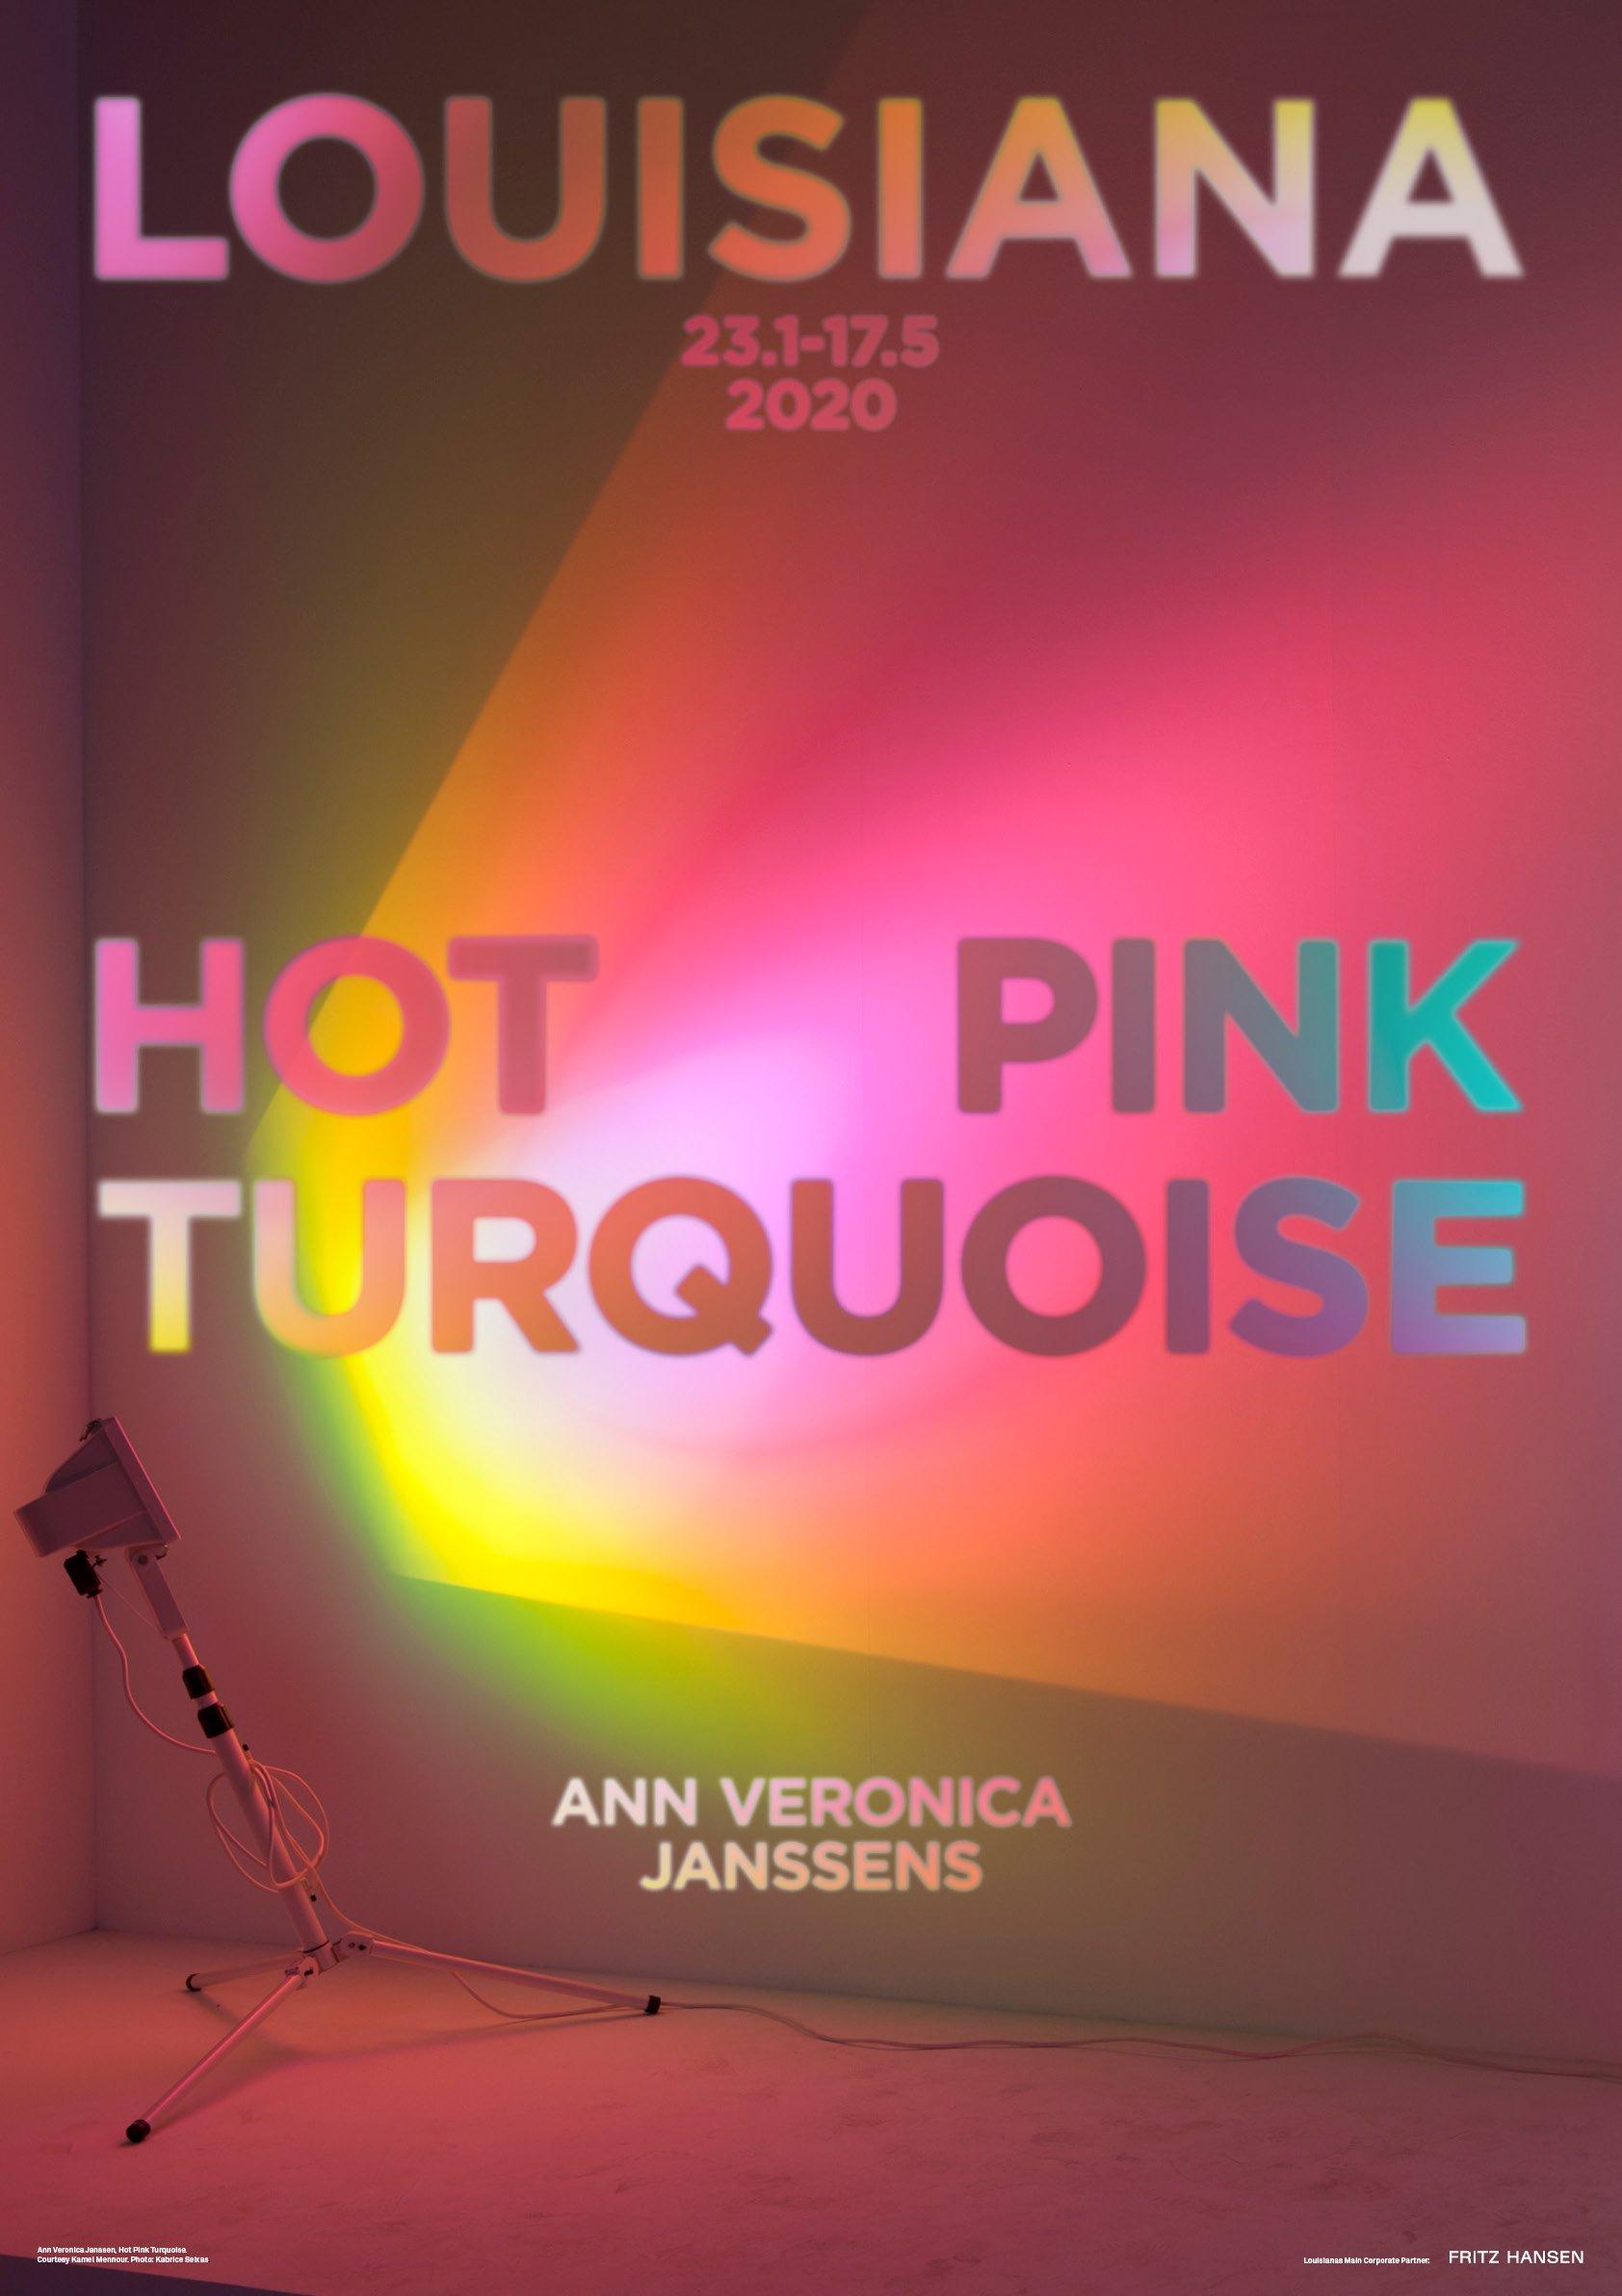 ann veronica janssens: hot pink turquoise